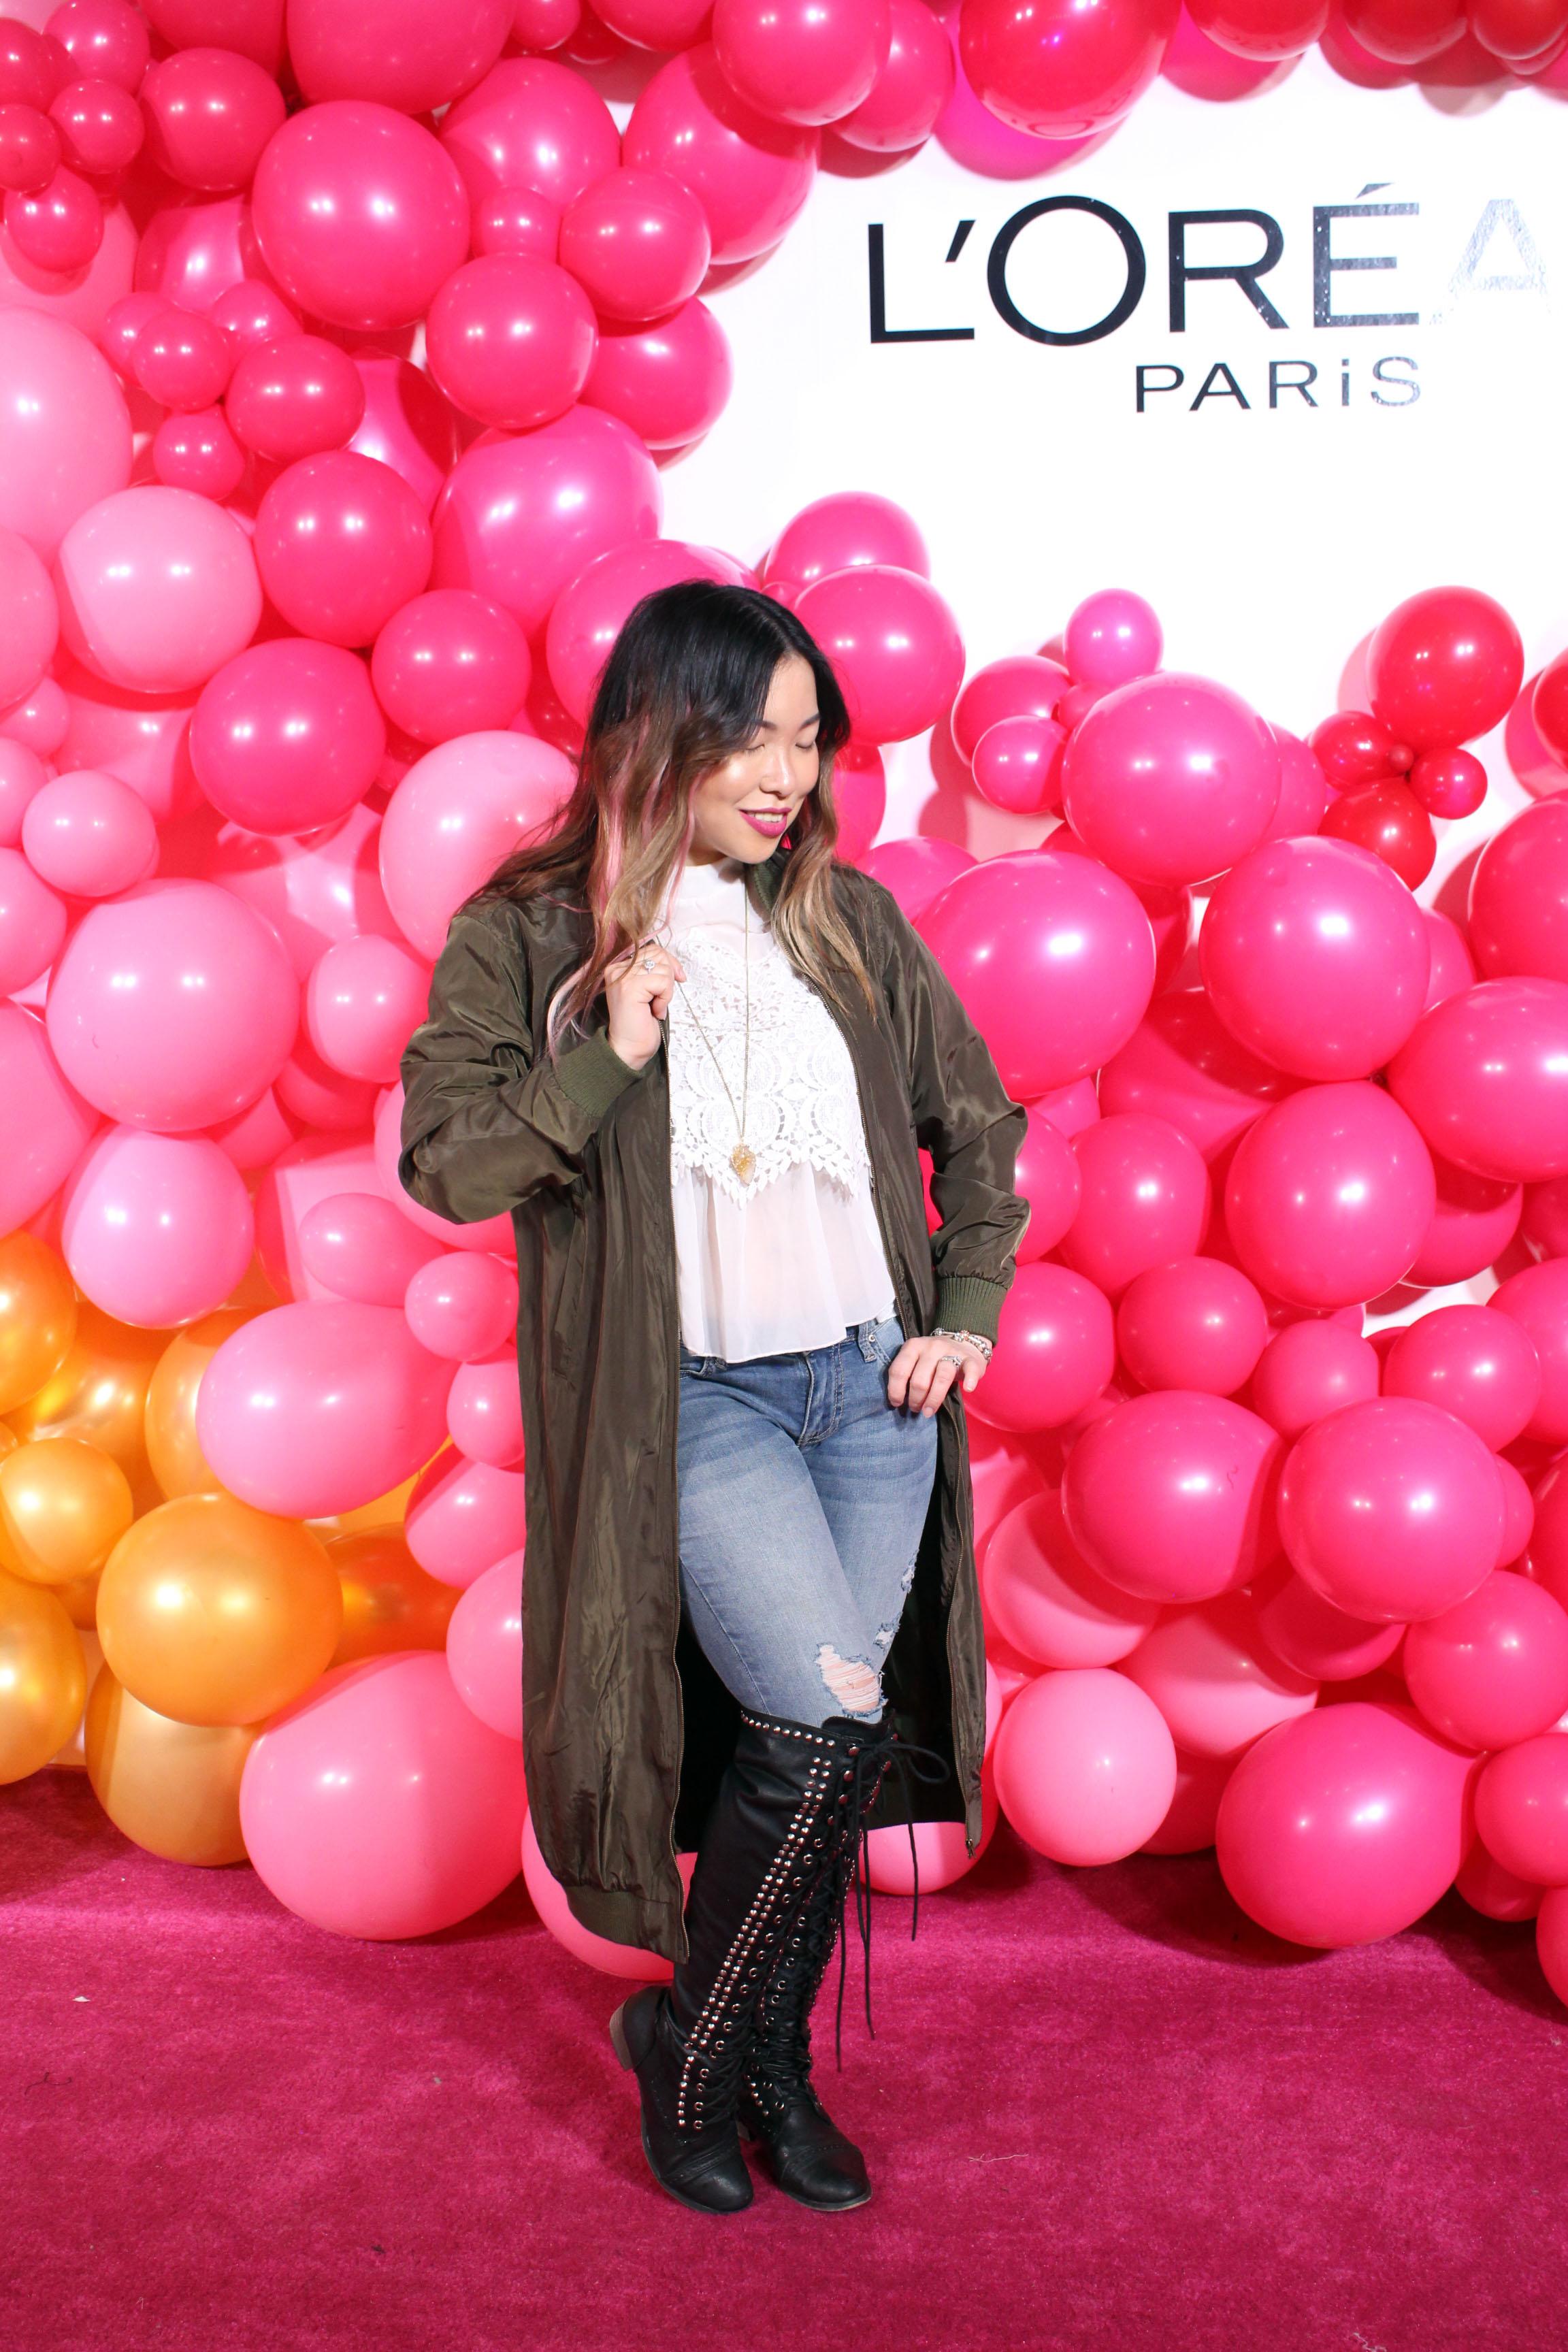 L'Oreal Beauty Blogger